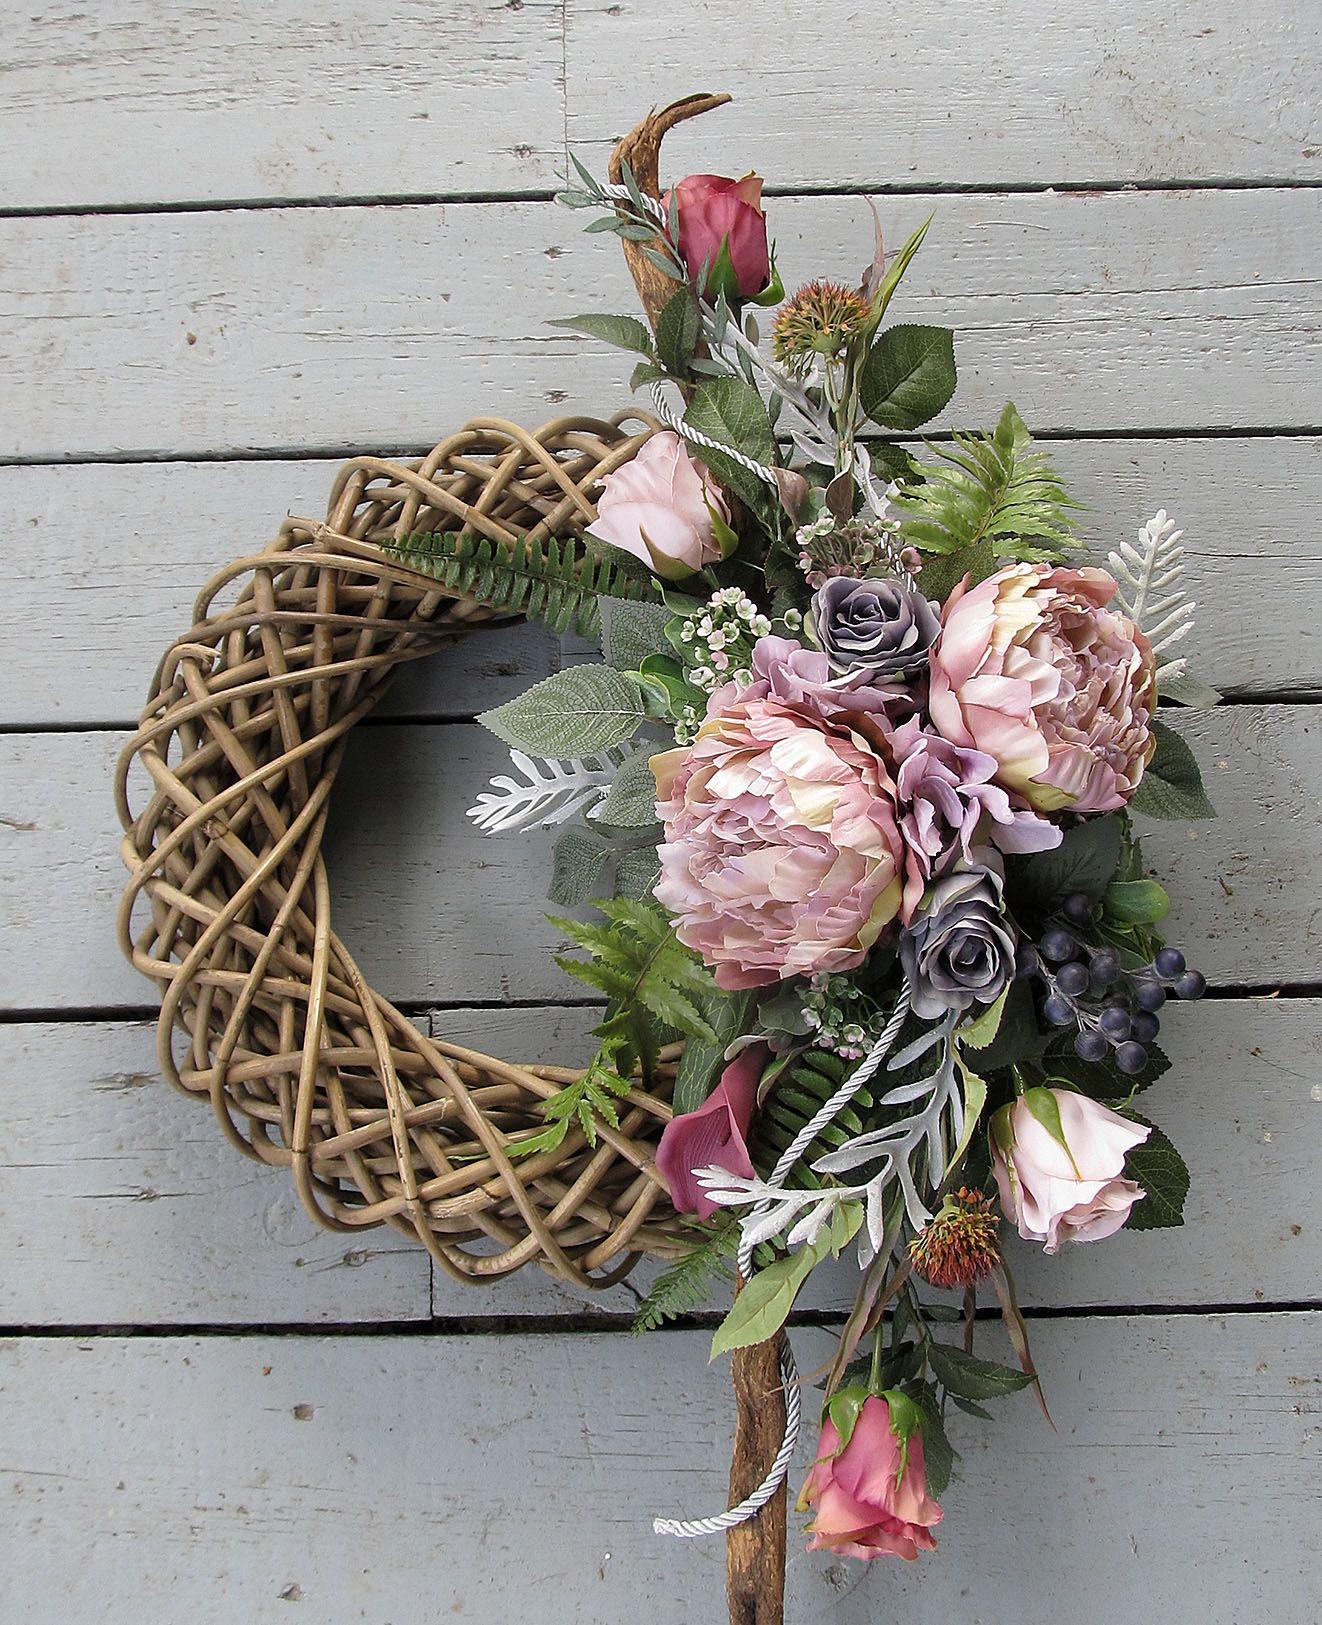 Pin By Blanka Frackowiak On In Memoriam Hanging Wreath Floral Wreath Flowers Perennials